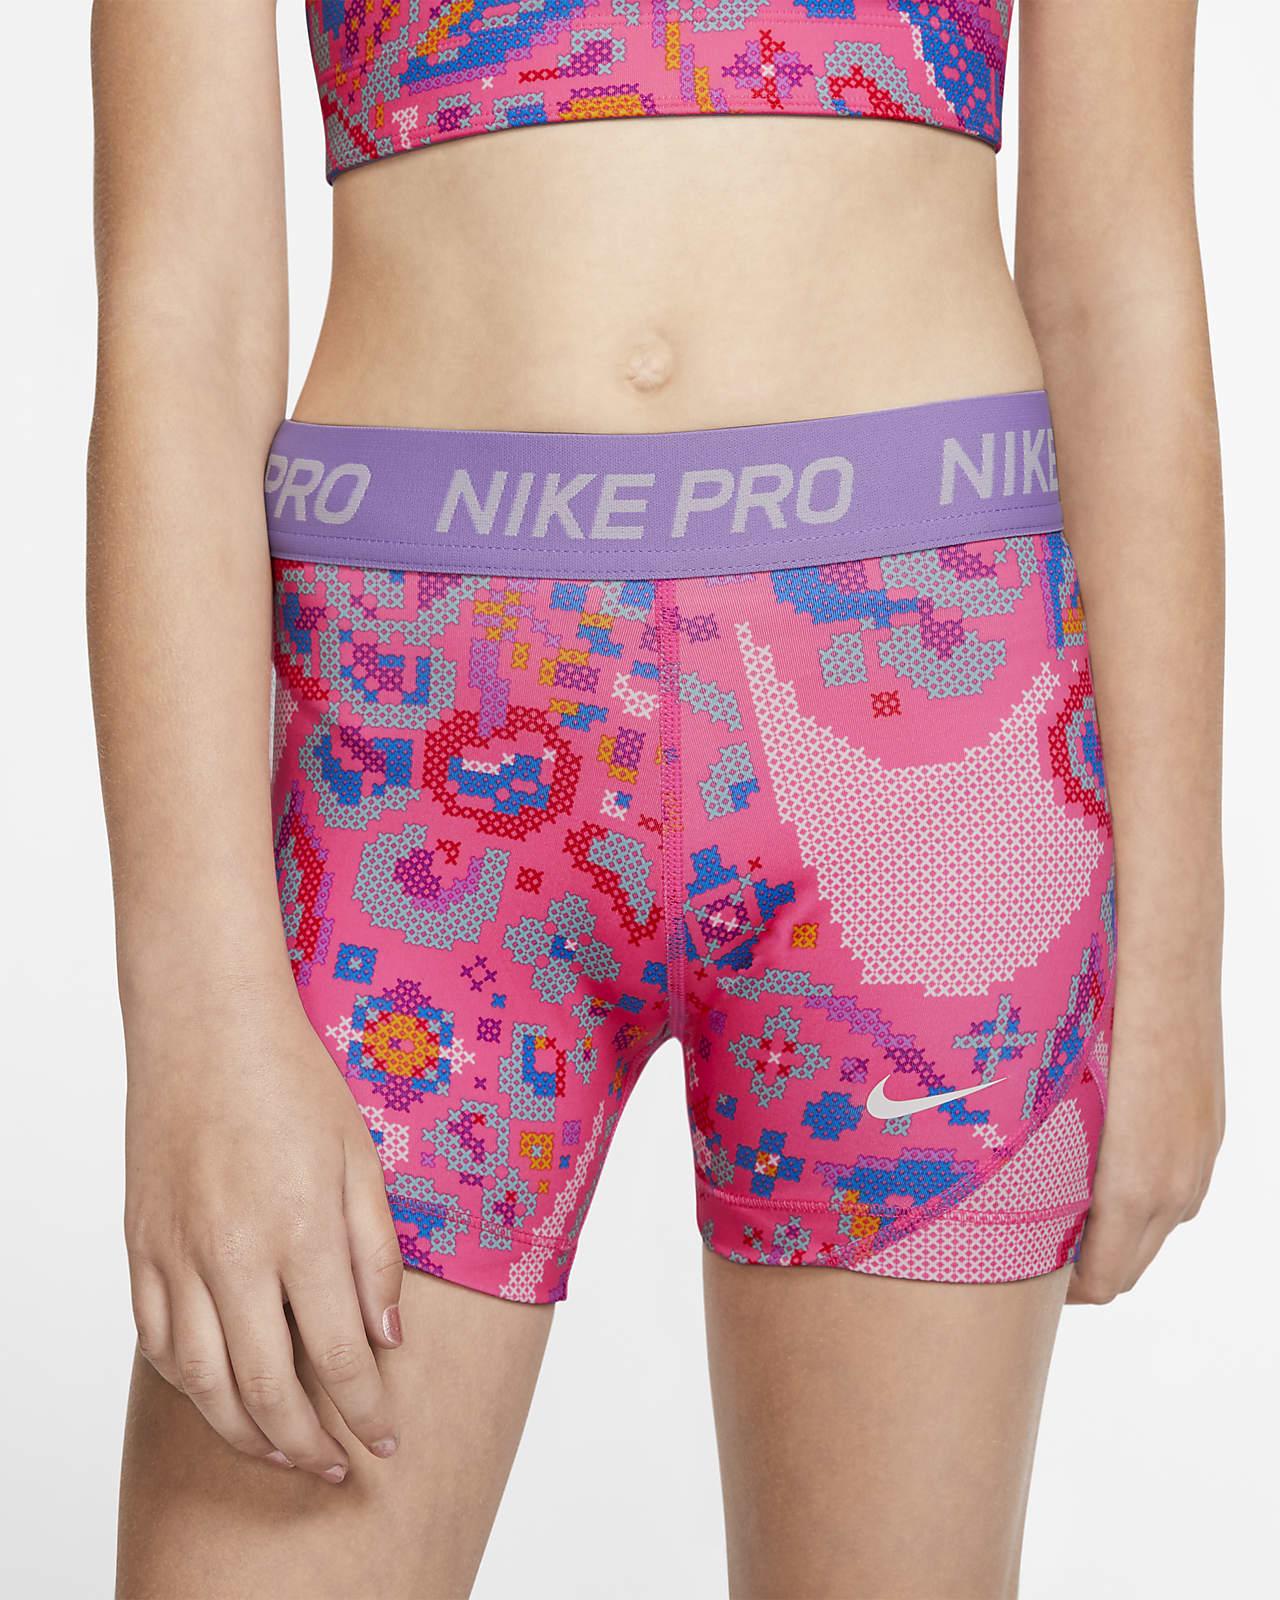 Nike Pro Culots estampats - Nena